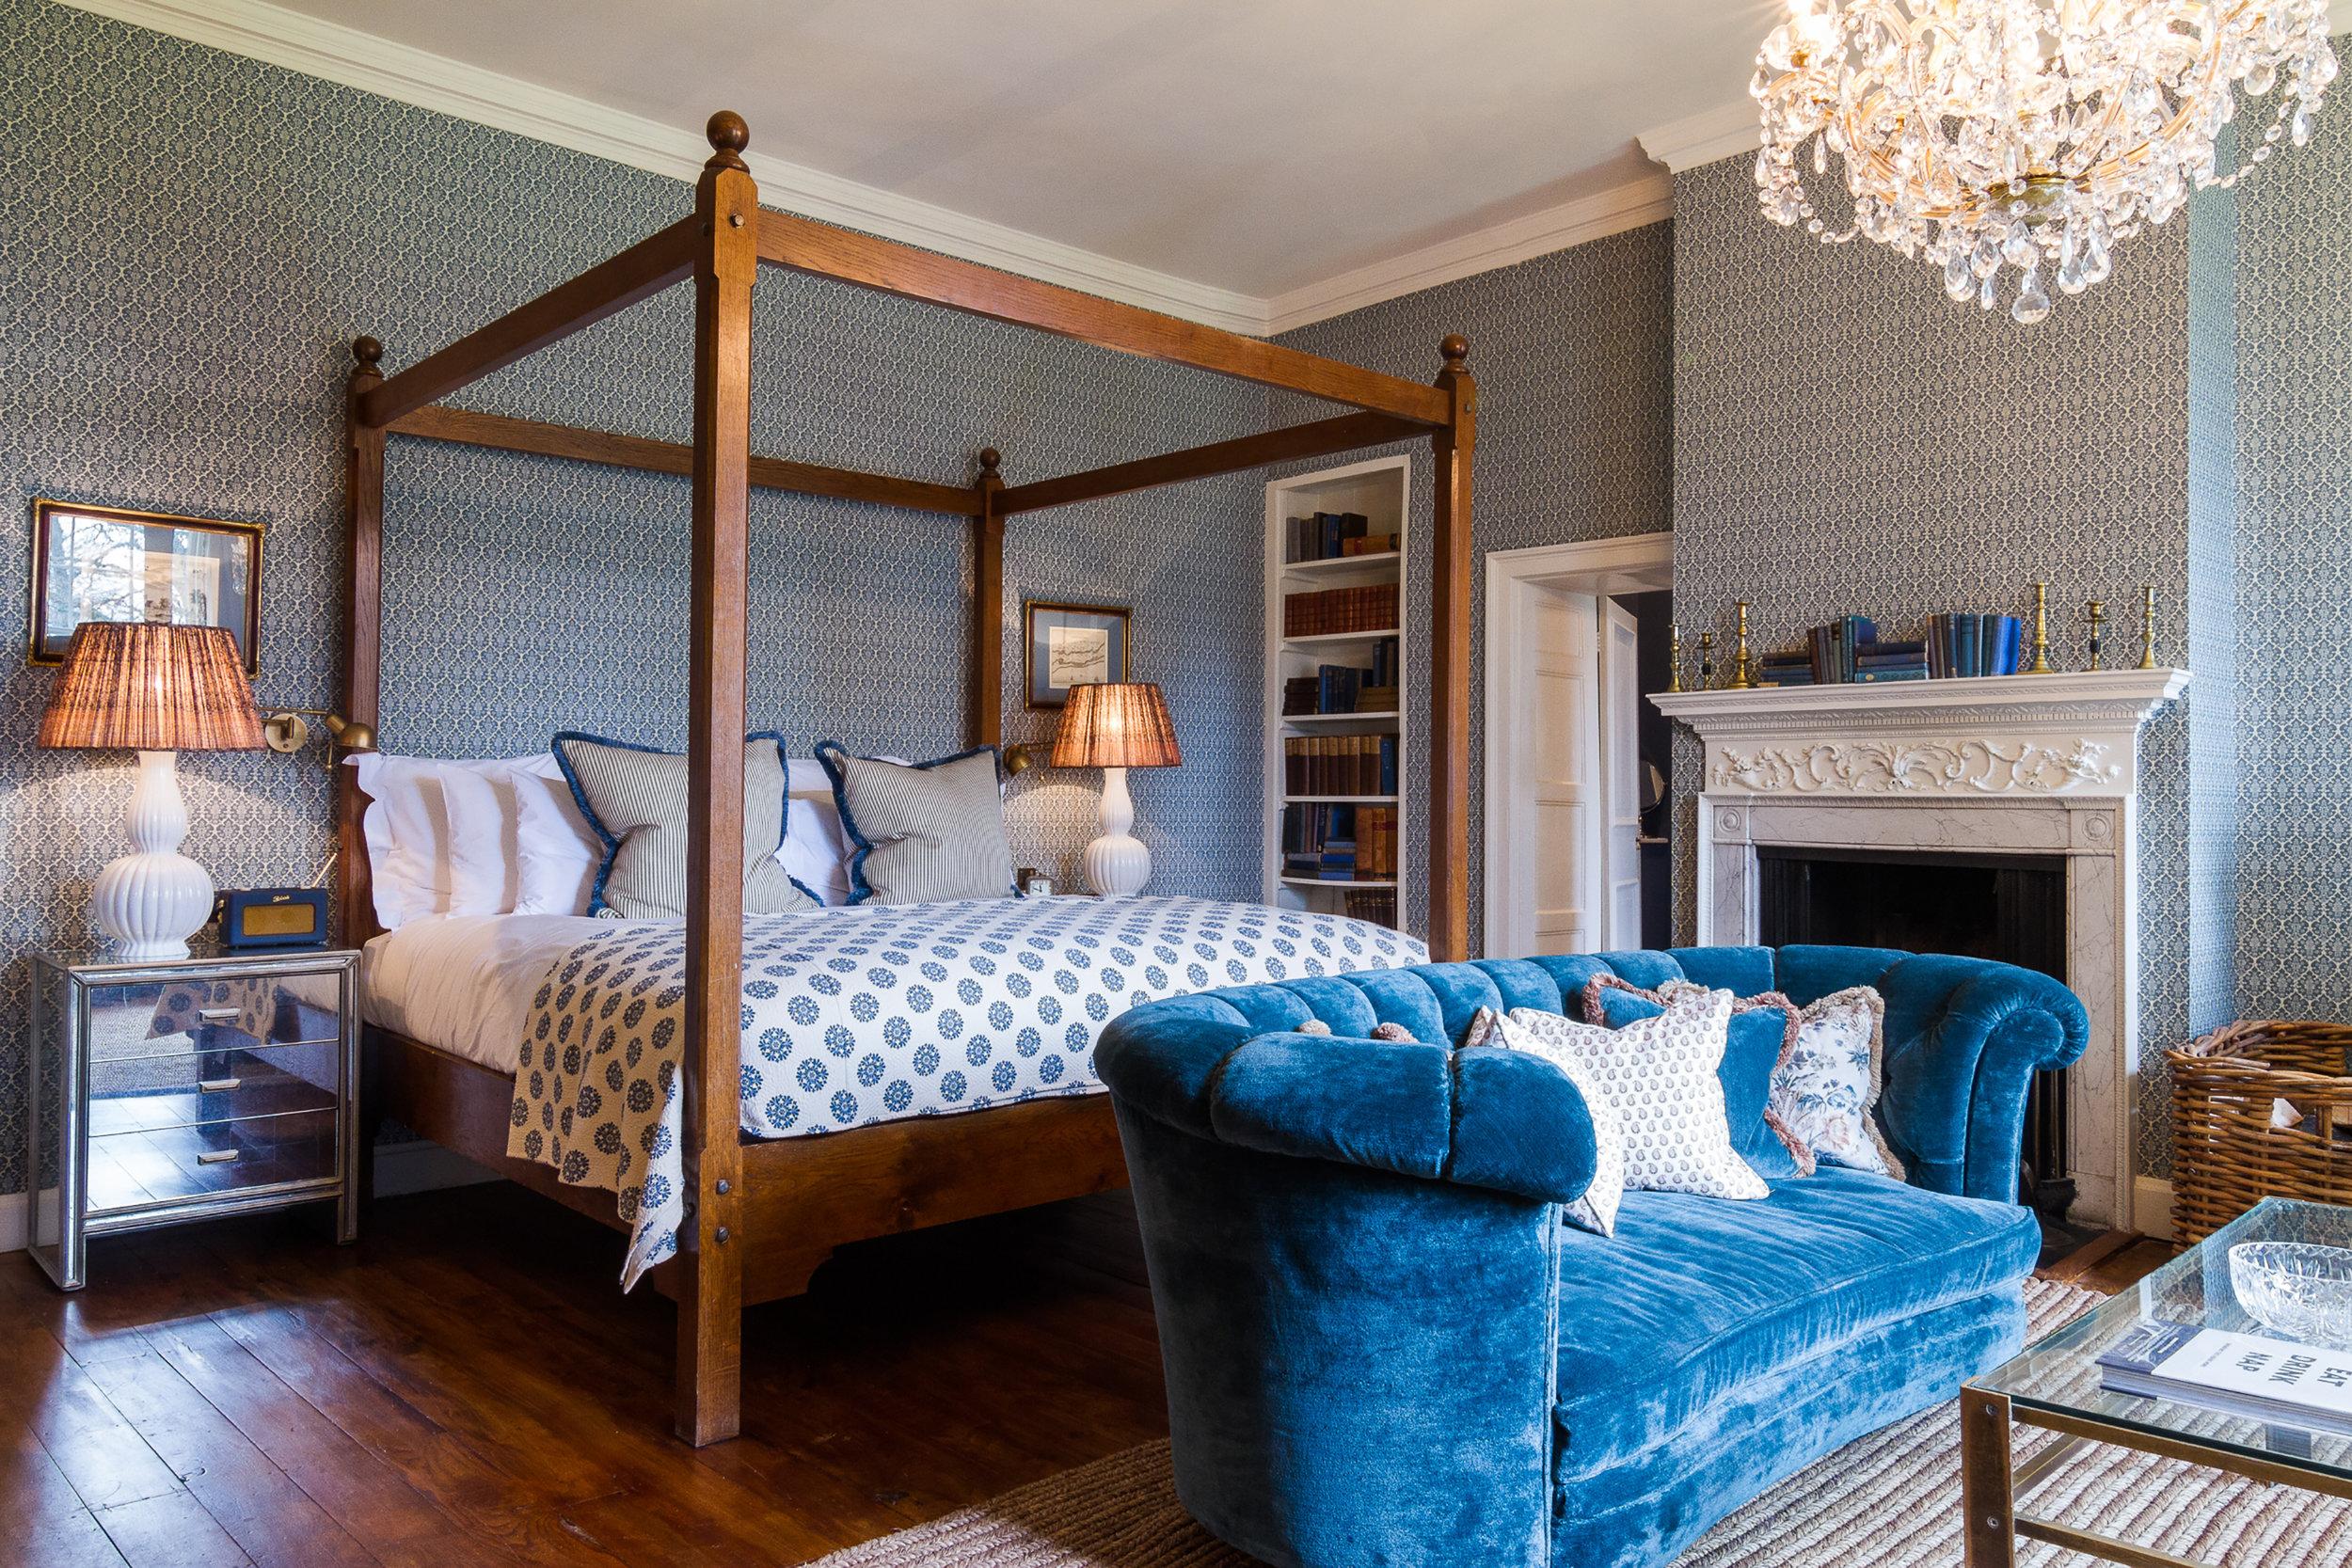 Copyright SohoHouseBabingtonHouse Refurbed Bedrooms 20160404 CT 01 LR.jpg